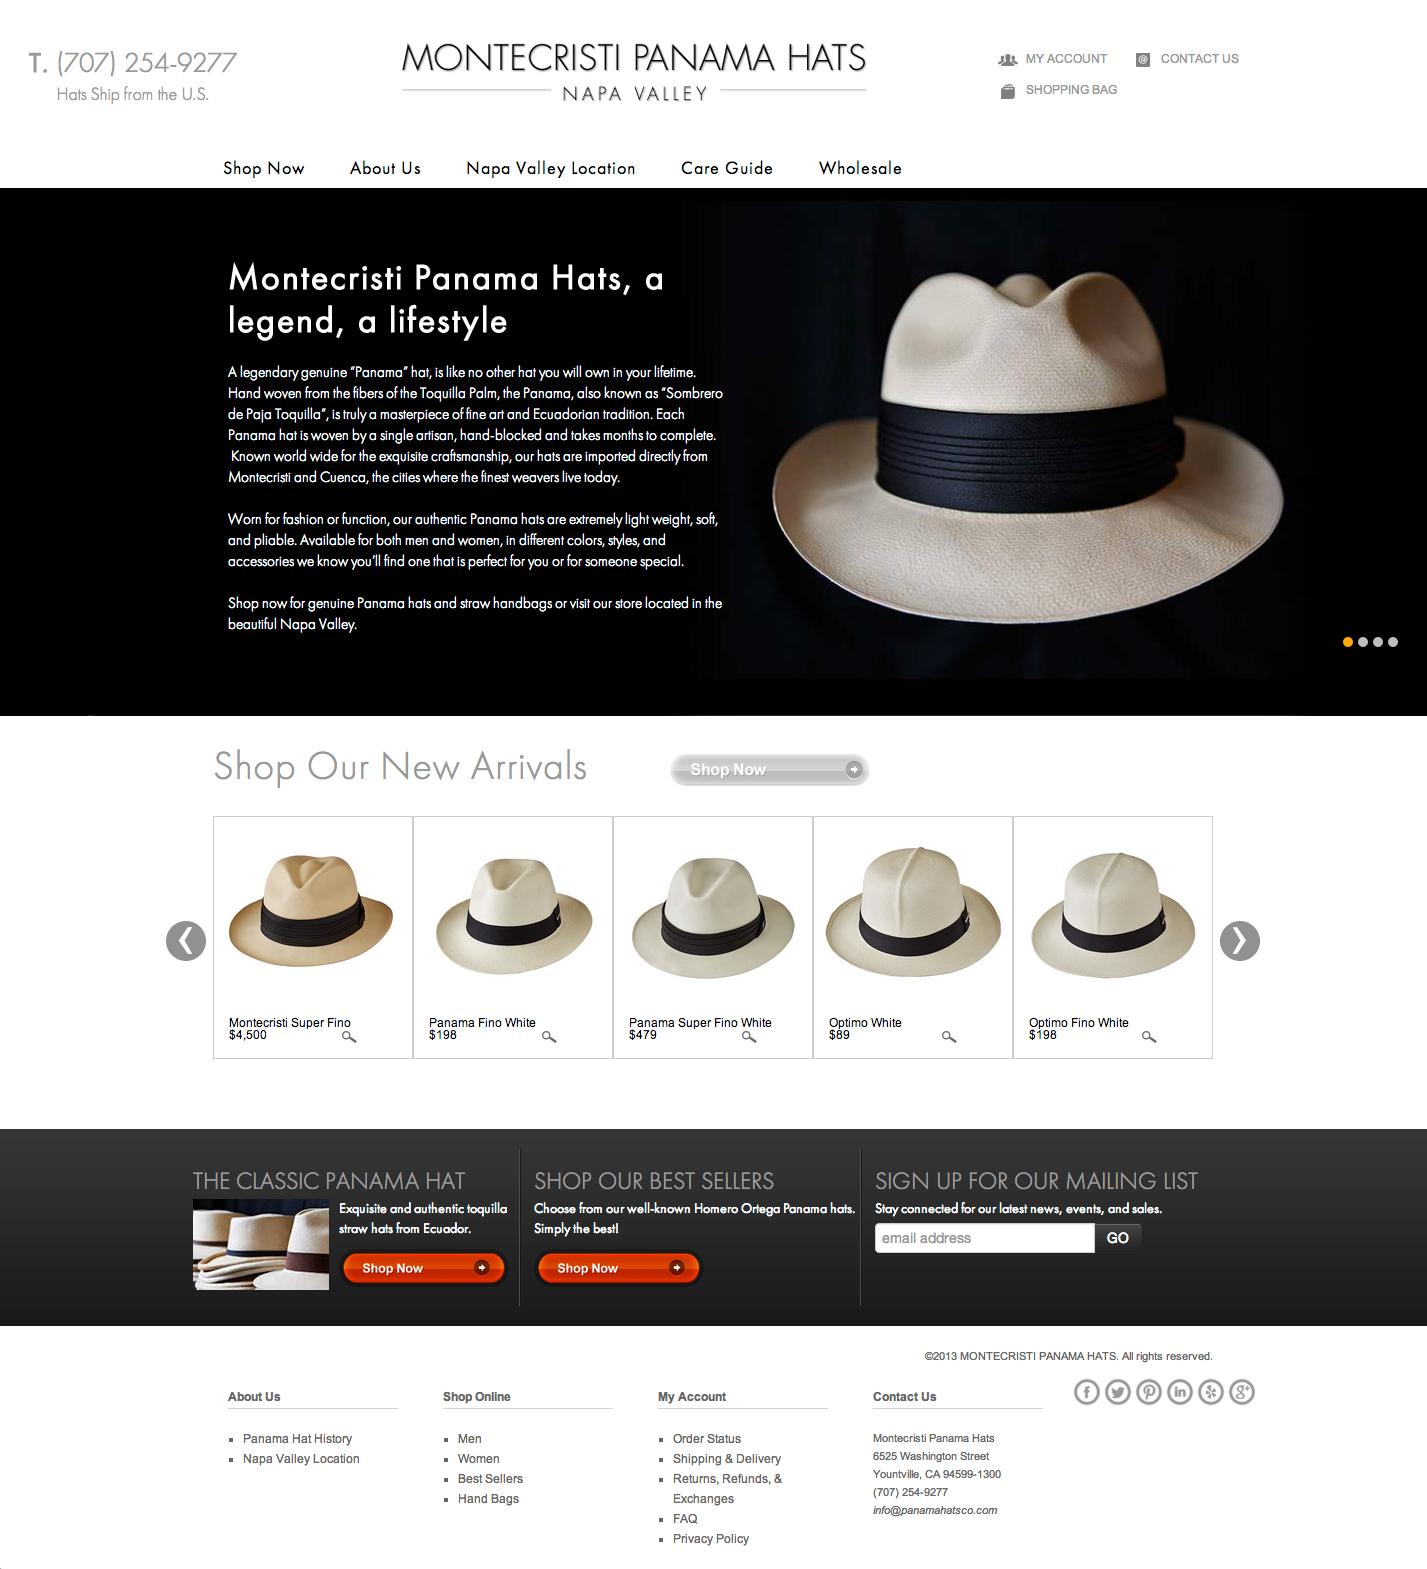 c337f3c4 Montecristi Panama Hats Launches New Website | Napa Valley, CA Patch